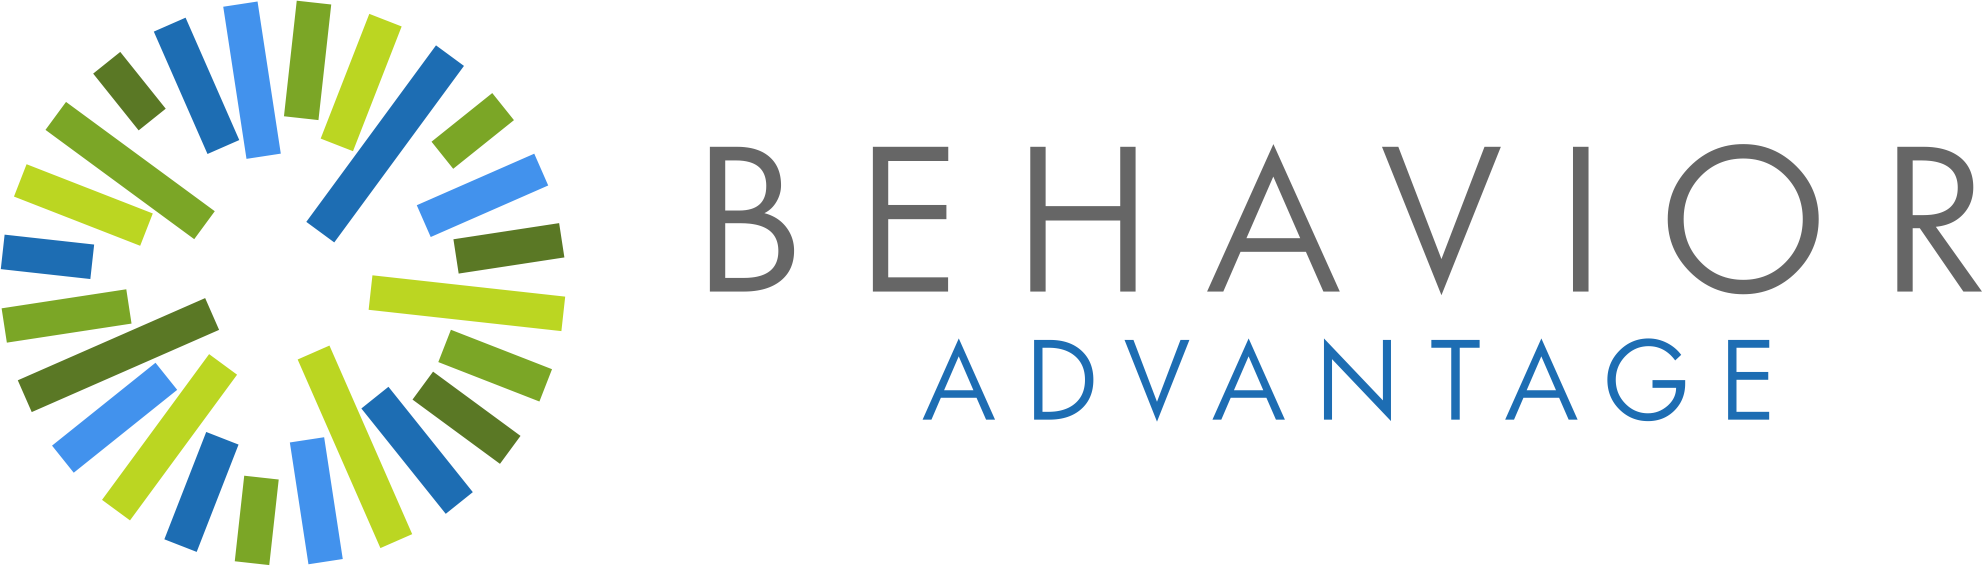 Behavior Advantage